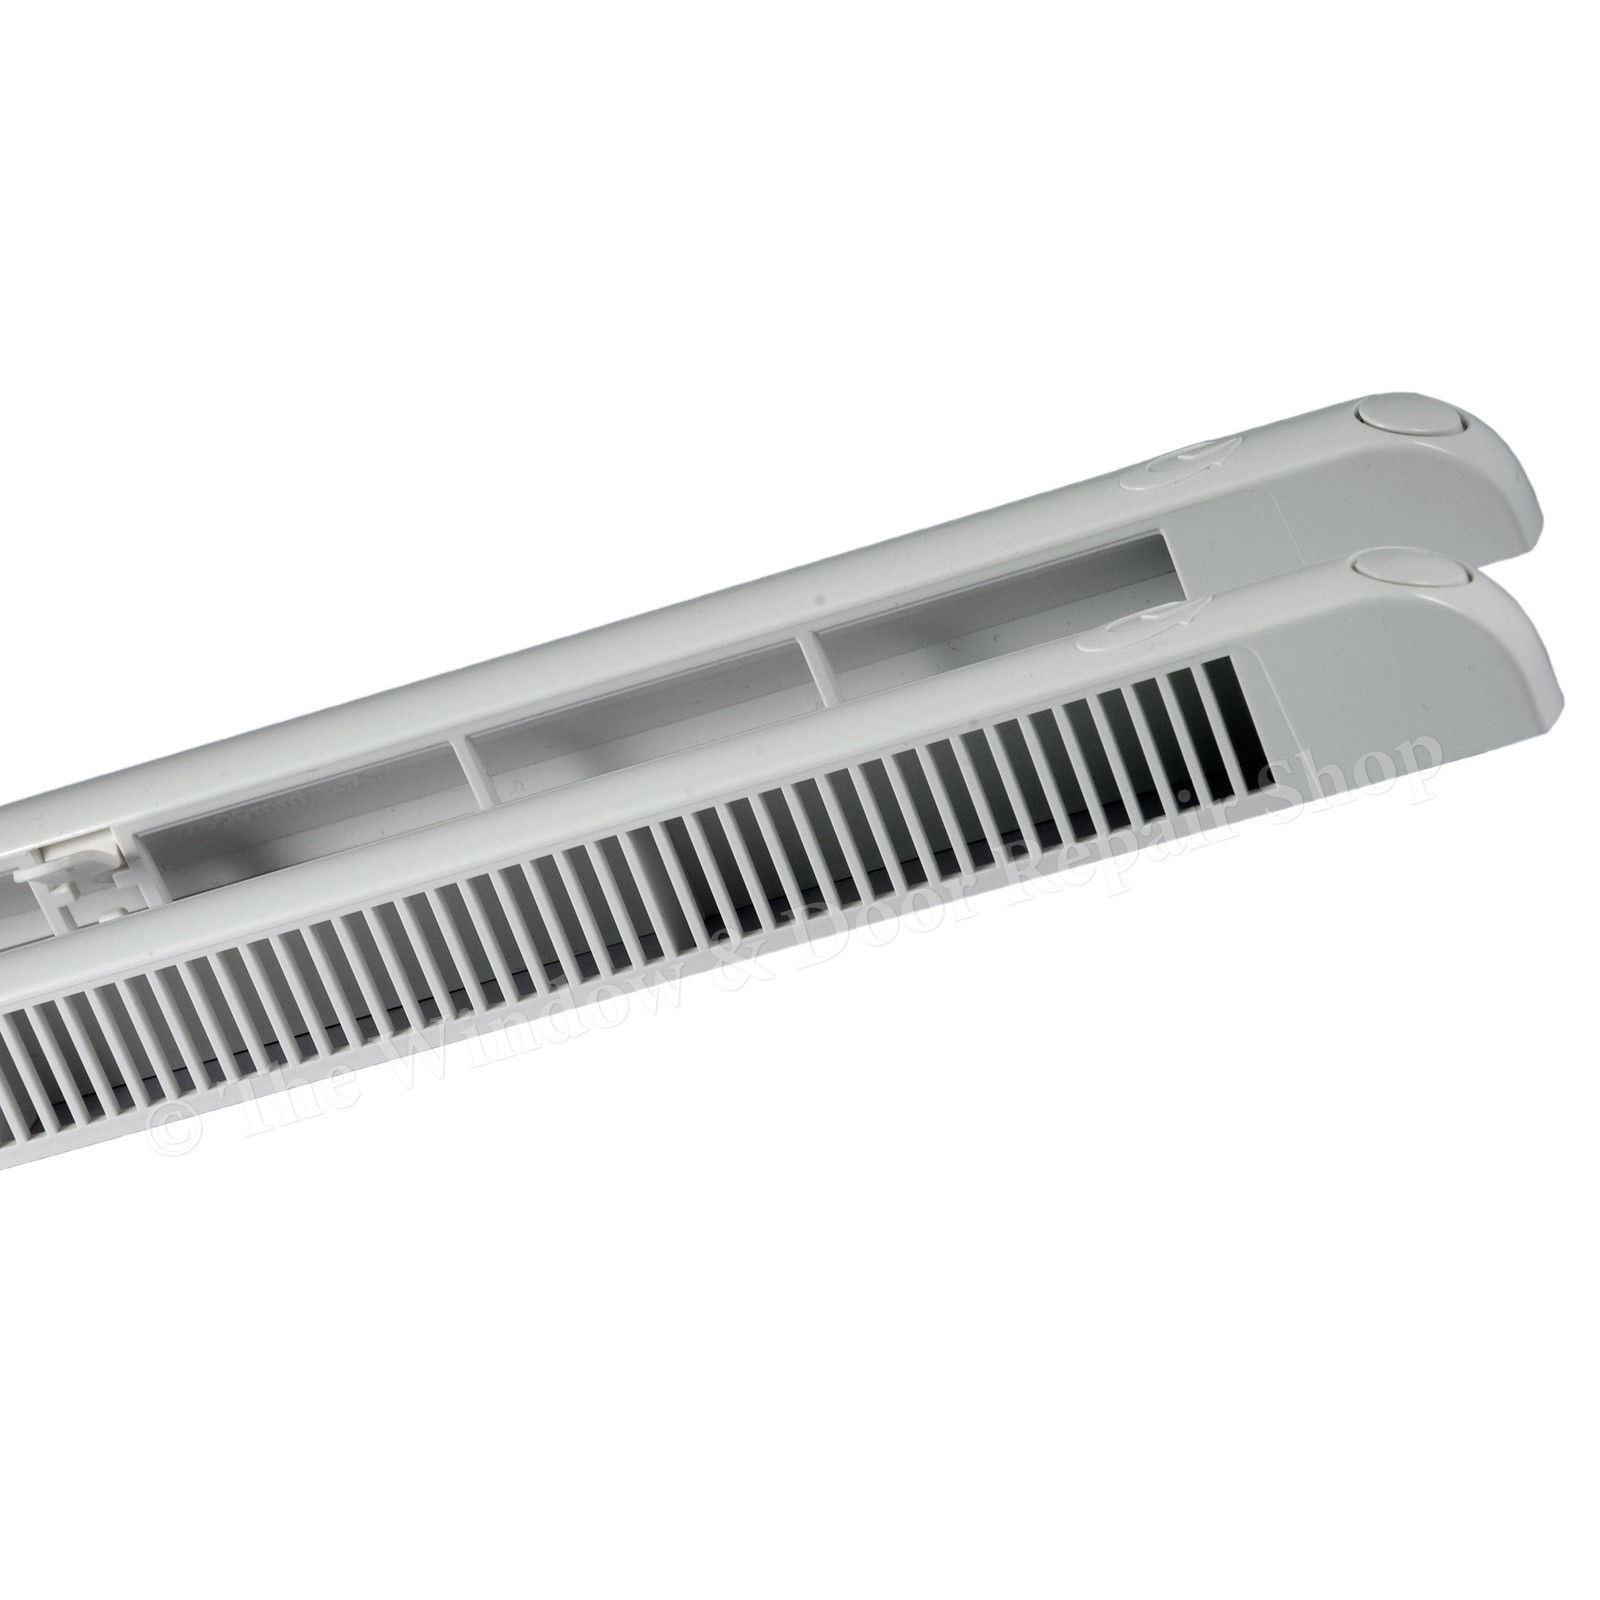 Greenwood-2000mm-4000mm-Trickle-Vent-UPVC-Timber-Windows-Slot-Vent-Night-PVCu